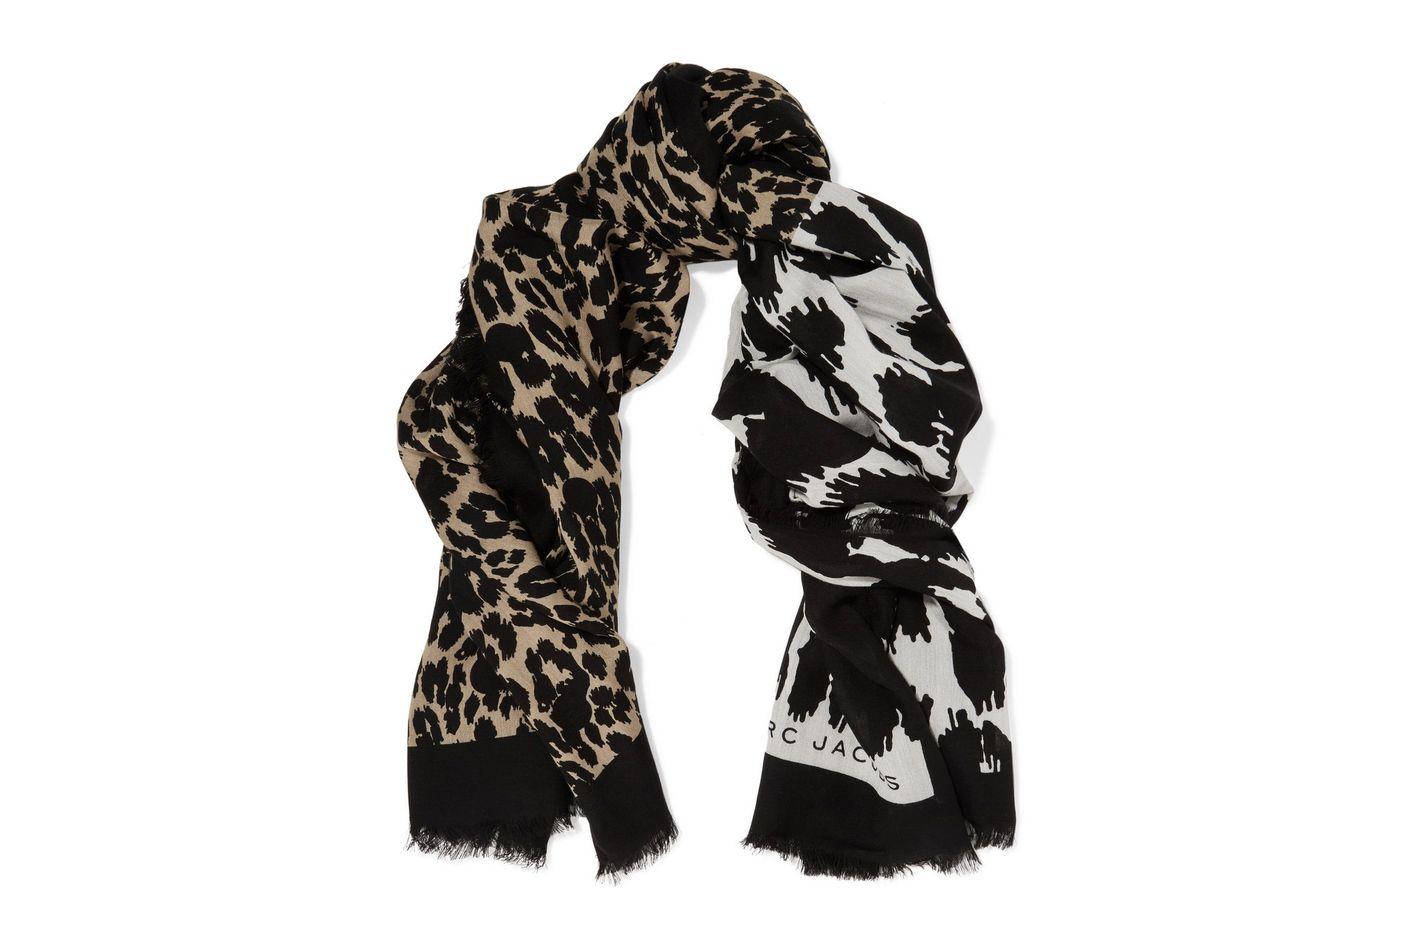 Marc Jacobs Leopard-Print Voile Scarf